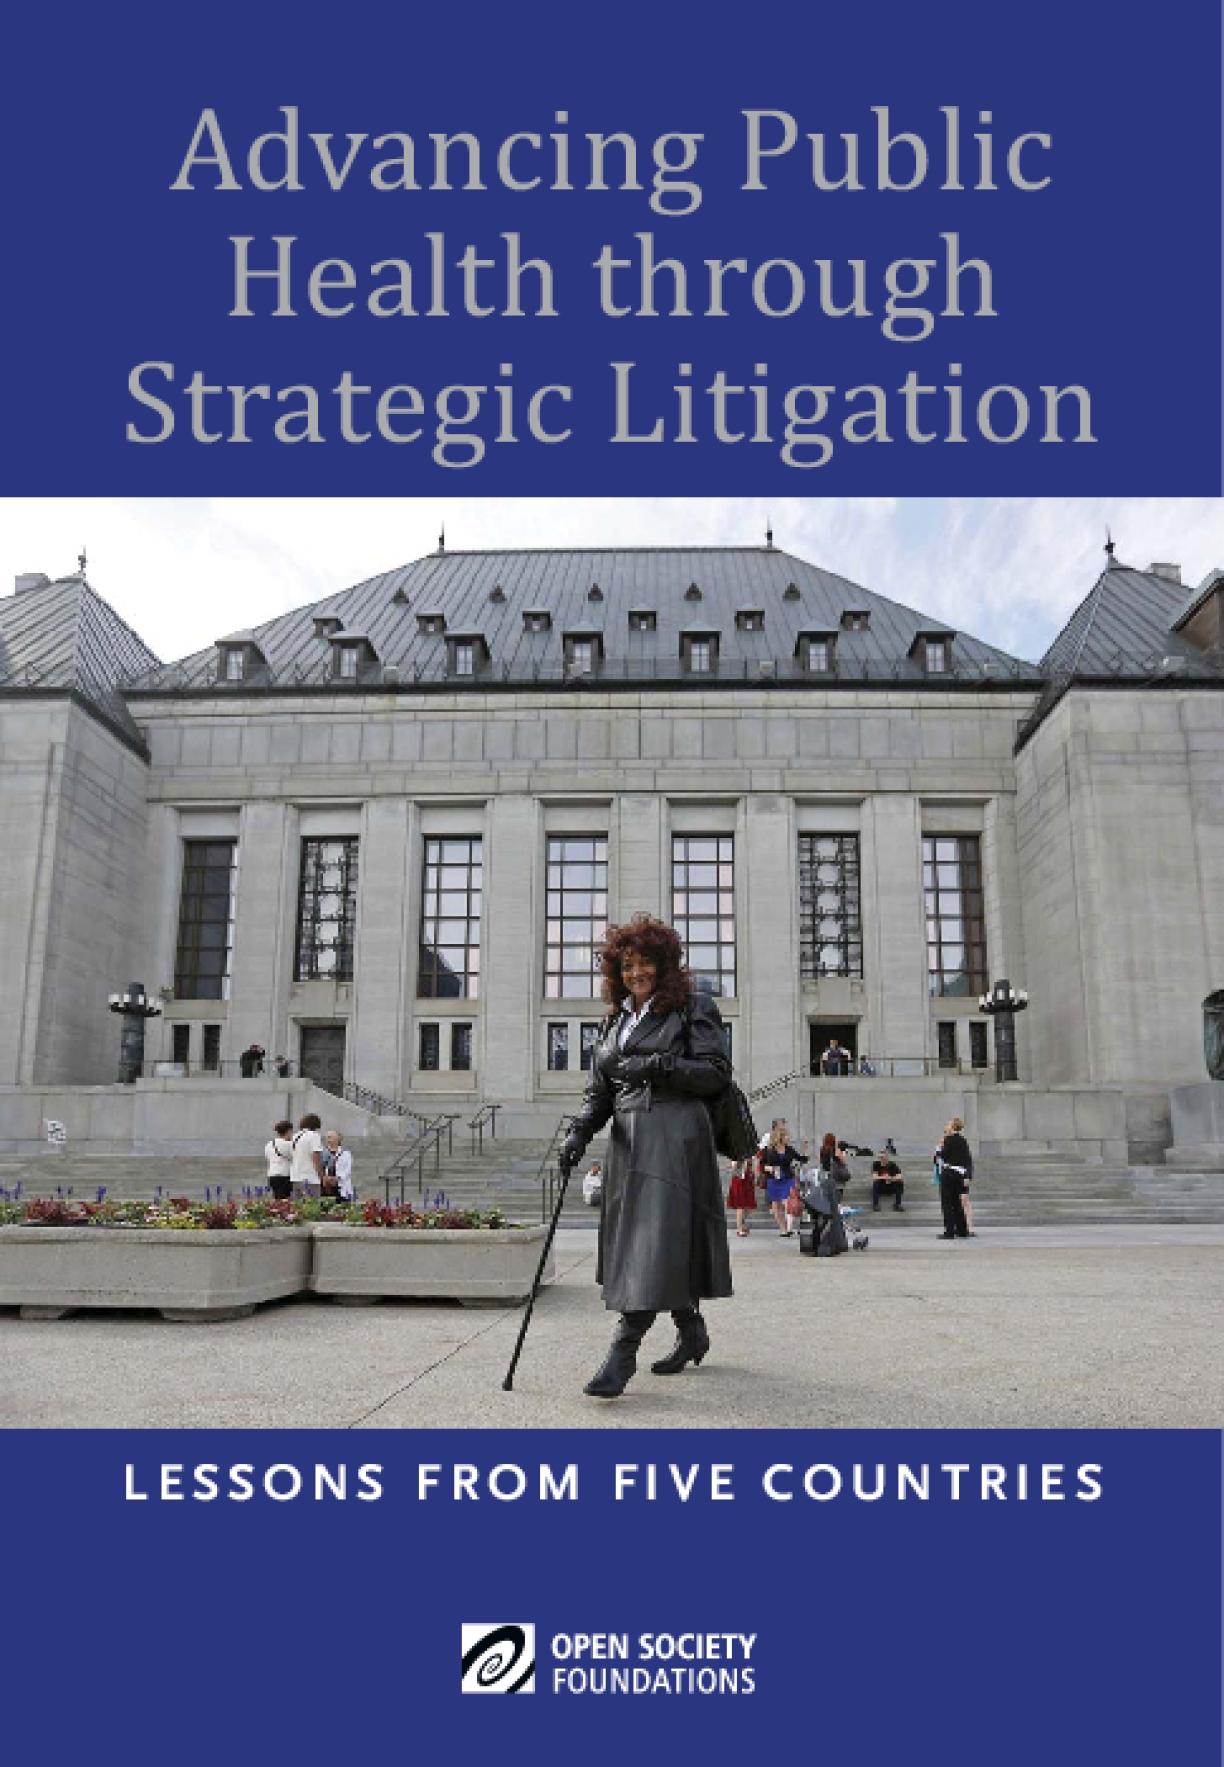 Advancing Public Health through Strategic Litigation